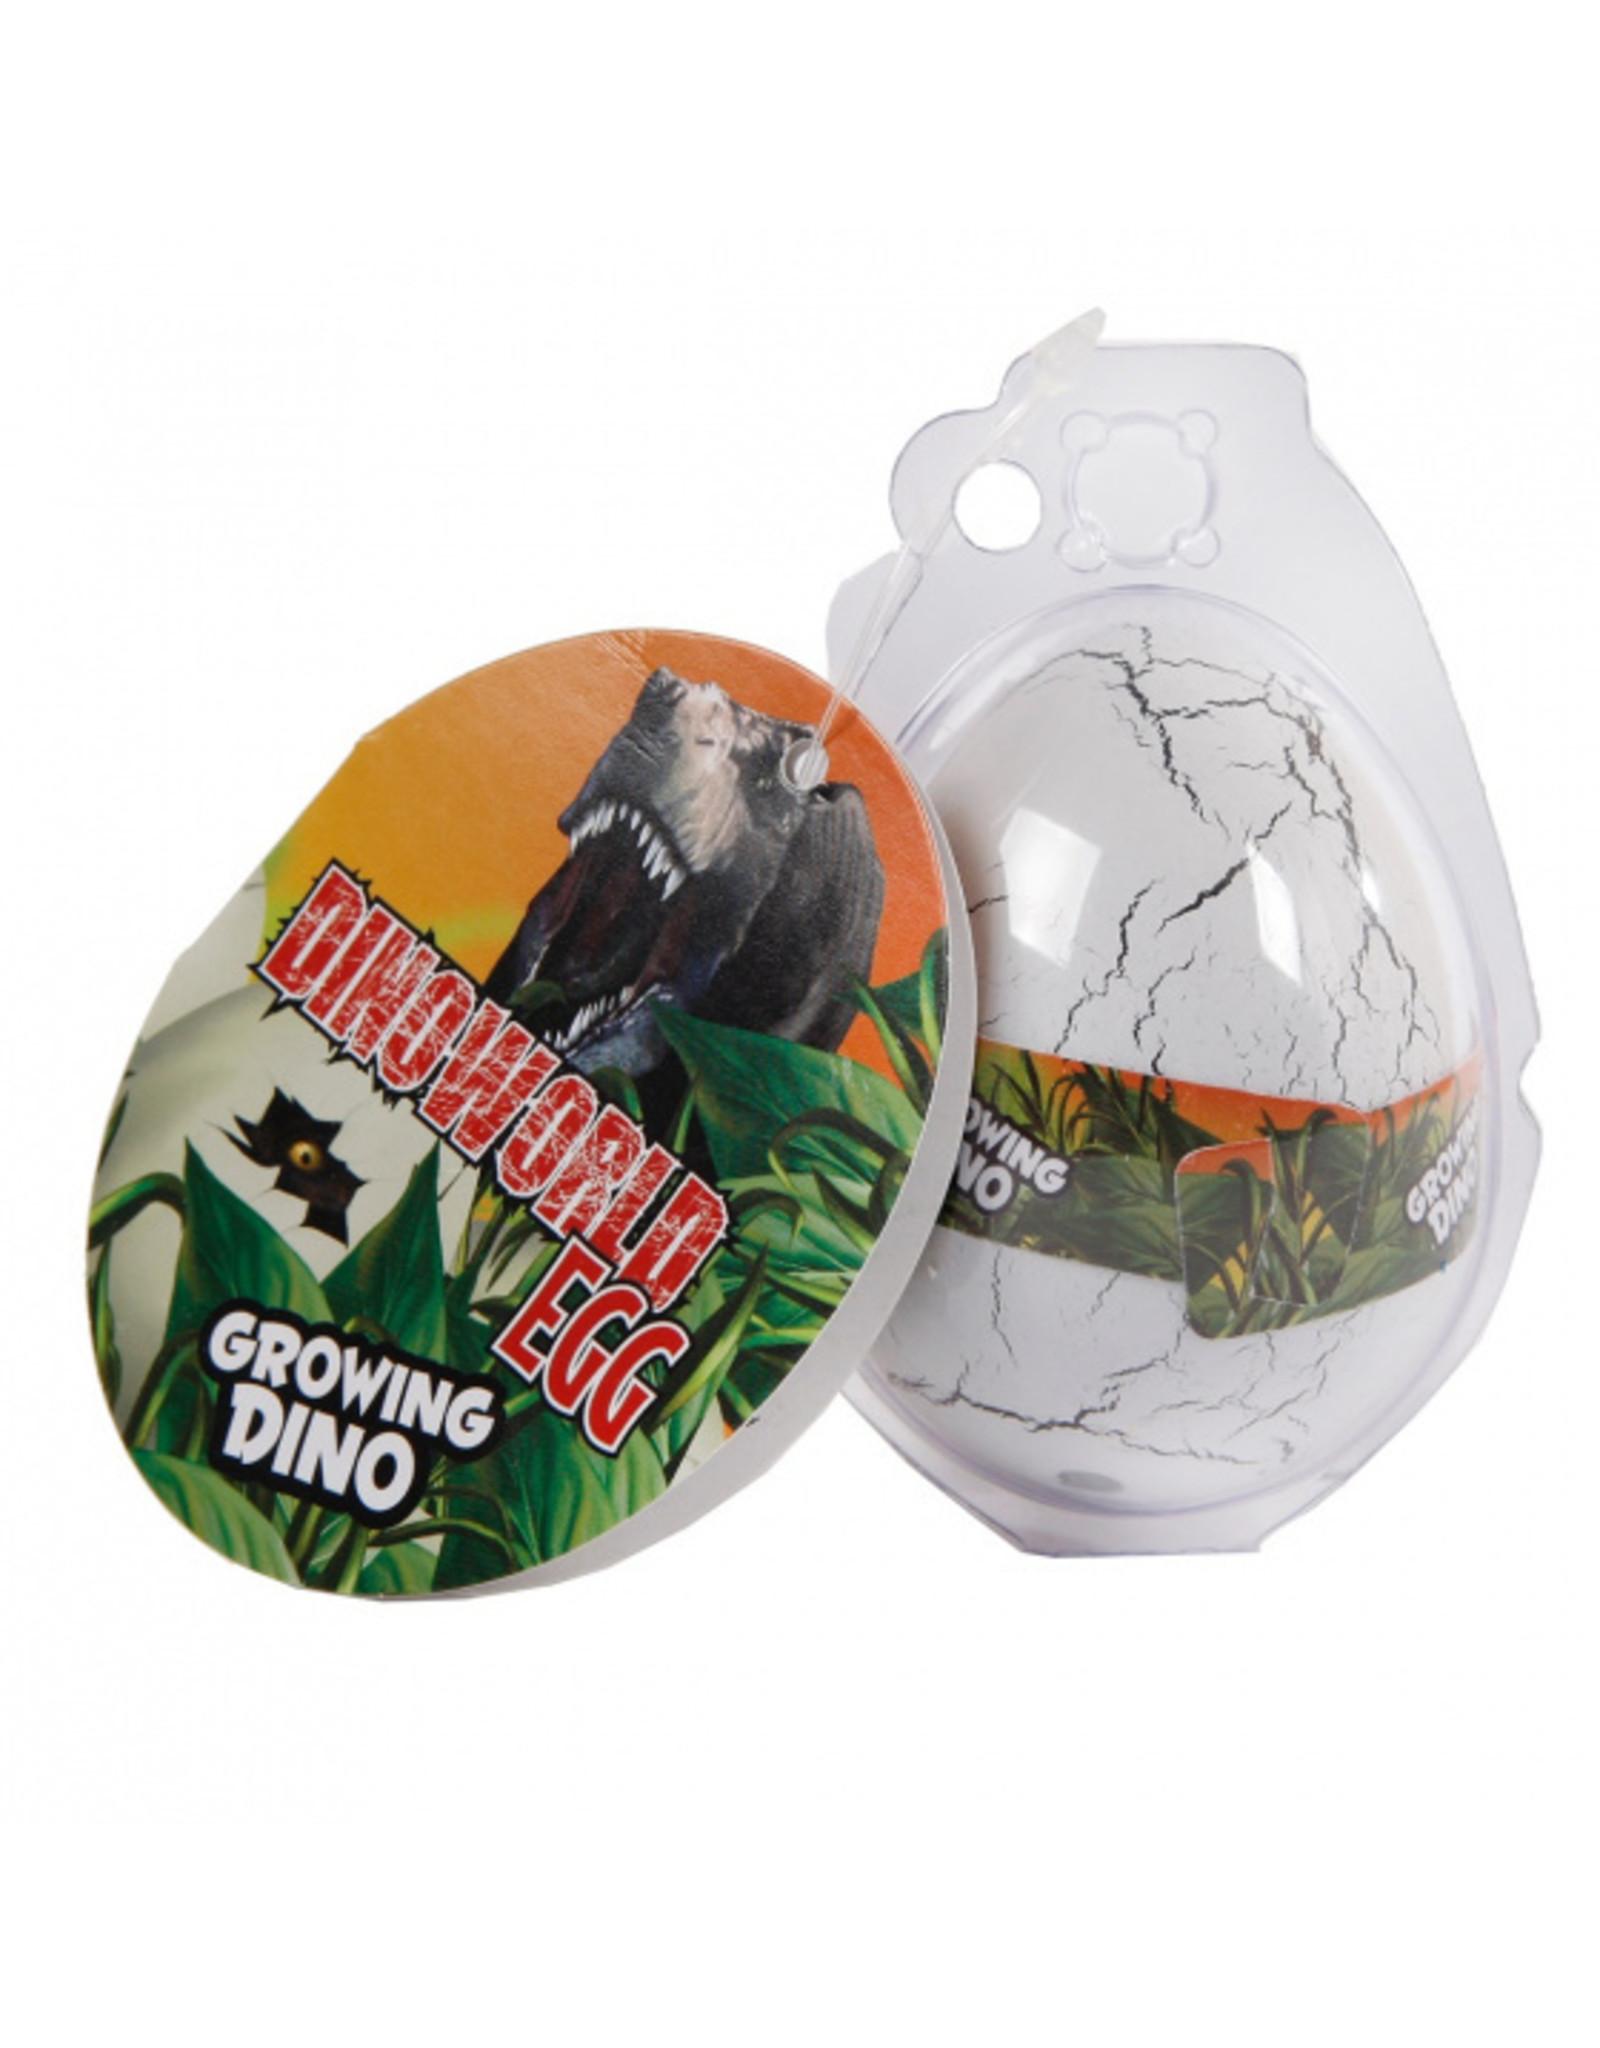 TOYS AMSTERDAM DinoWorld ei met groeiende dinosaurus